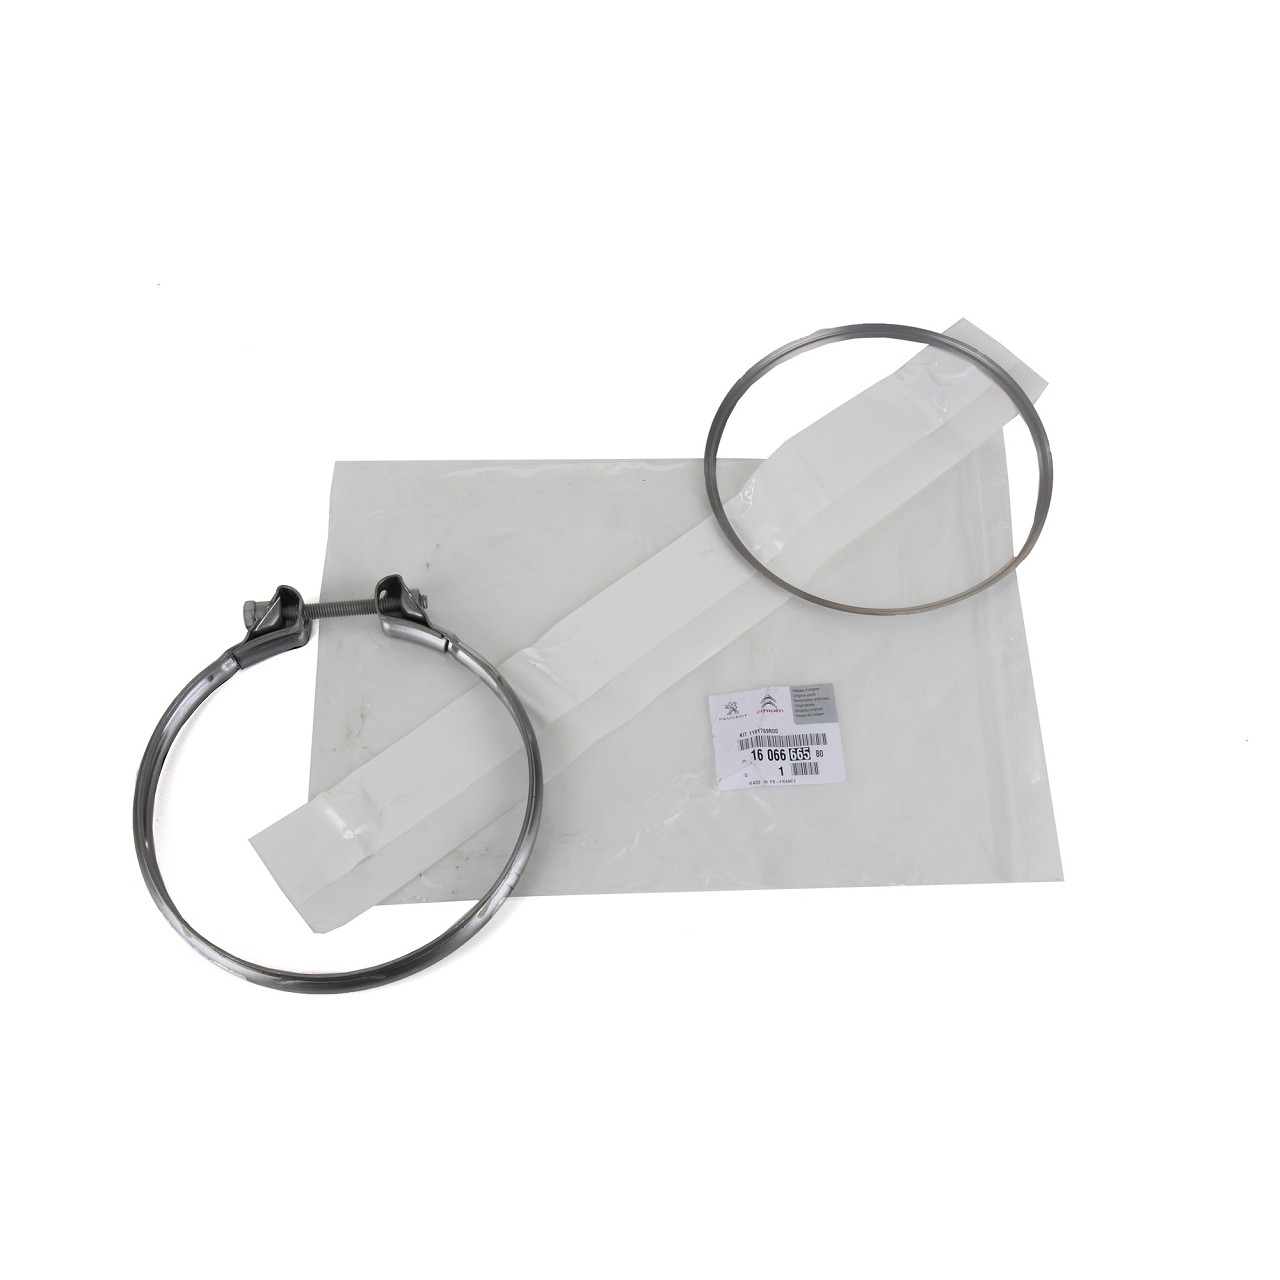 ORIGINAL Citroen Peugeot Rohrverbinder Montagesatz Schalldämpfer 1606666580